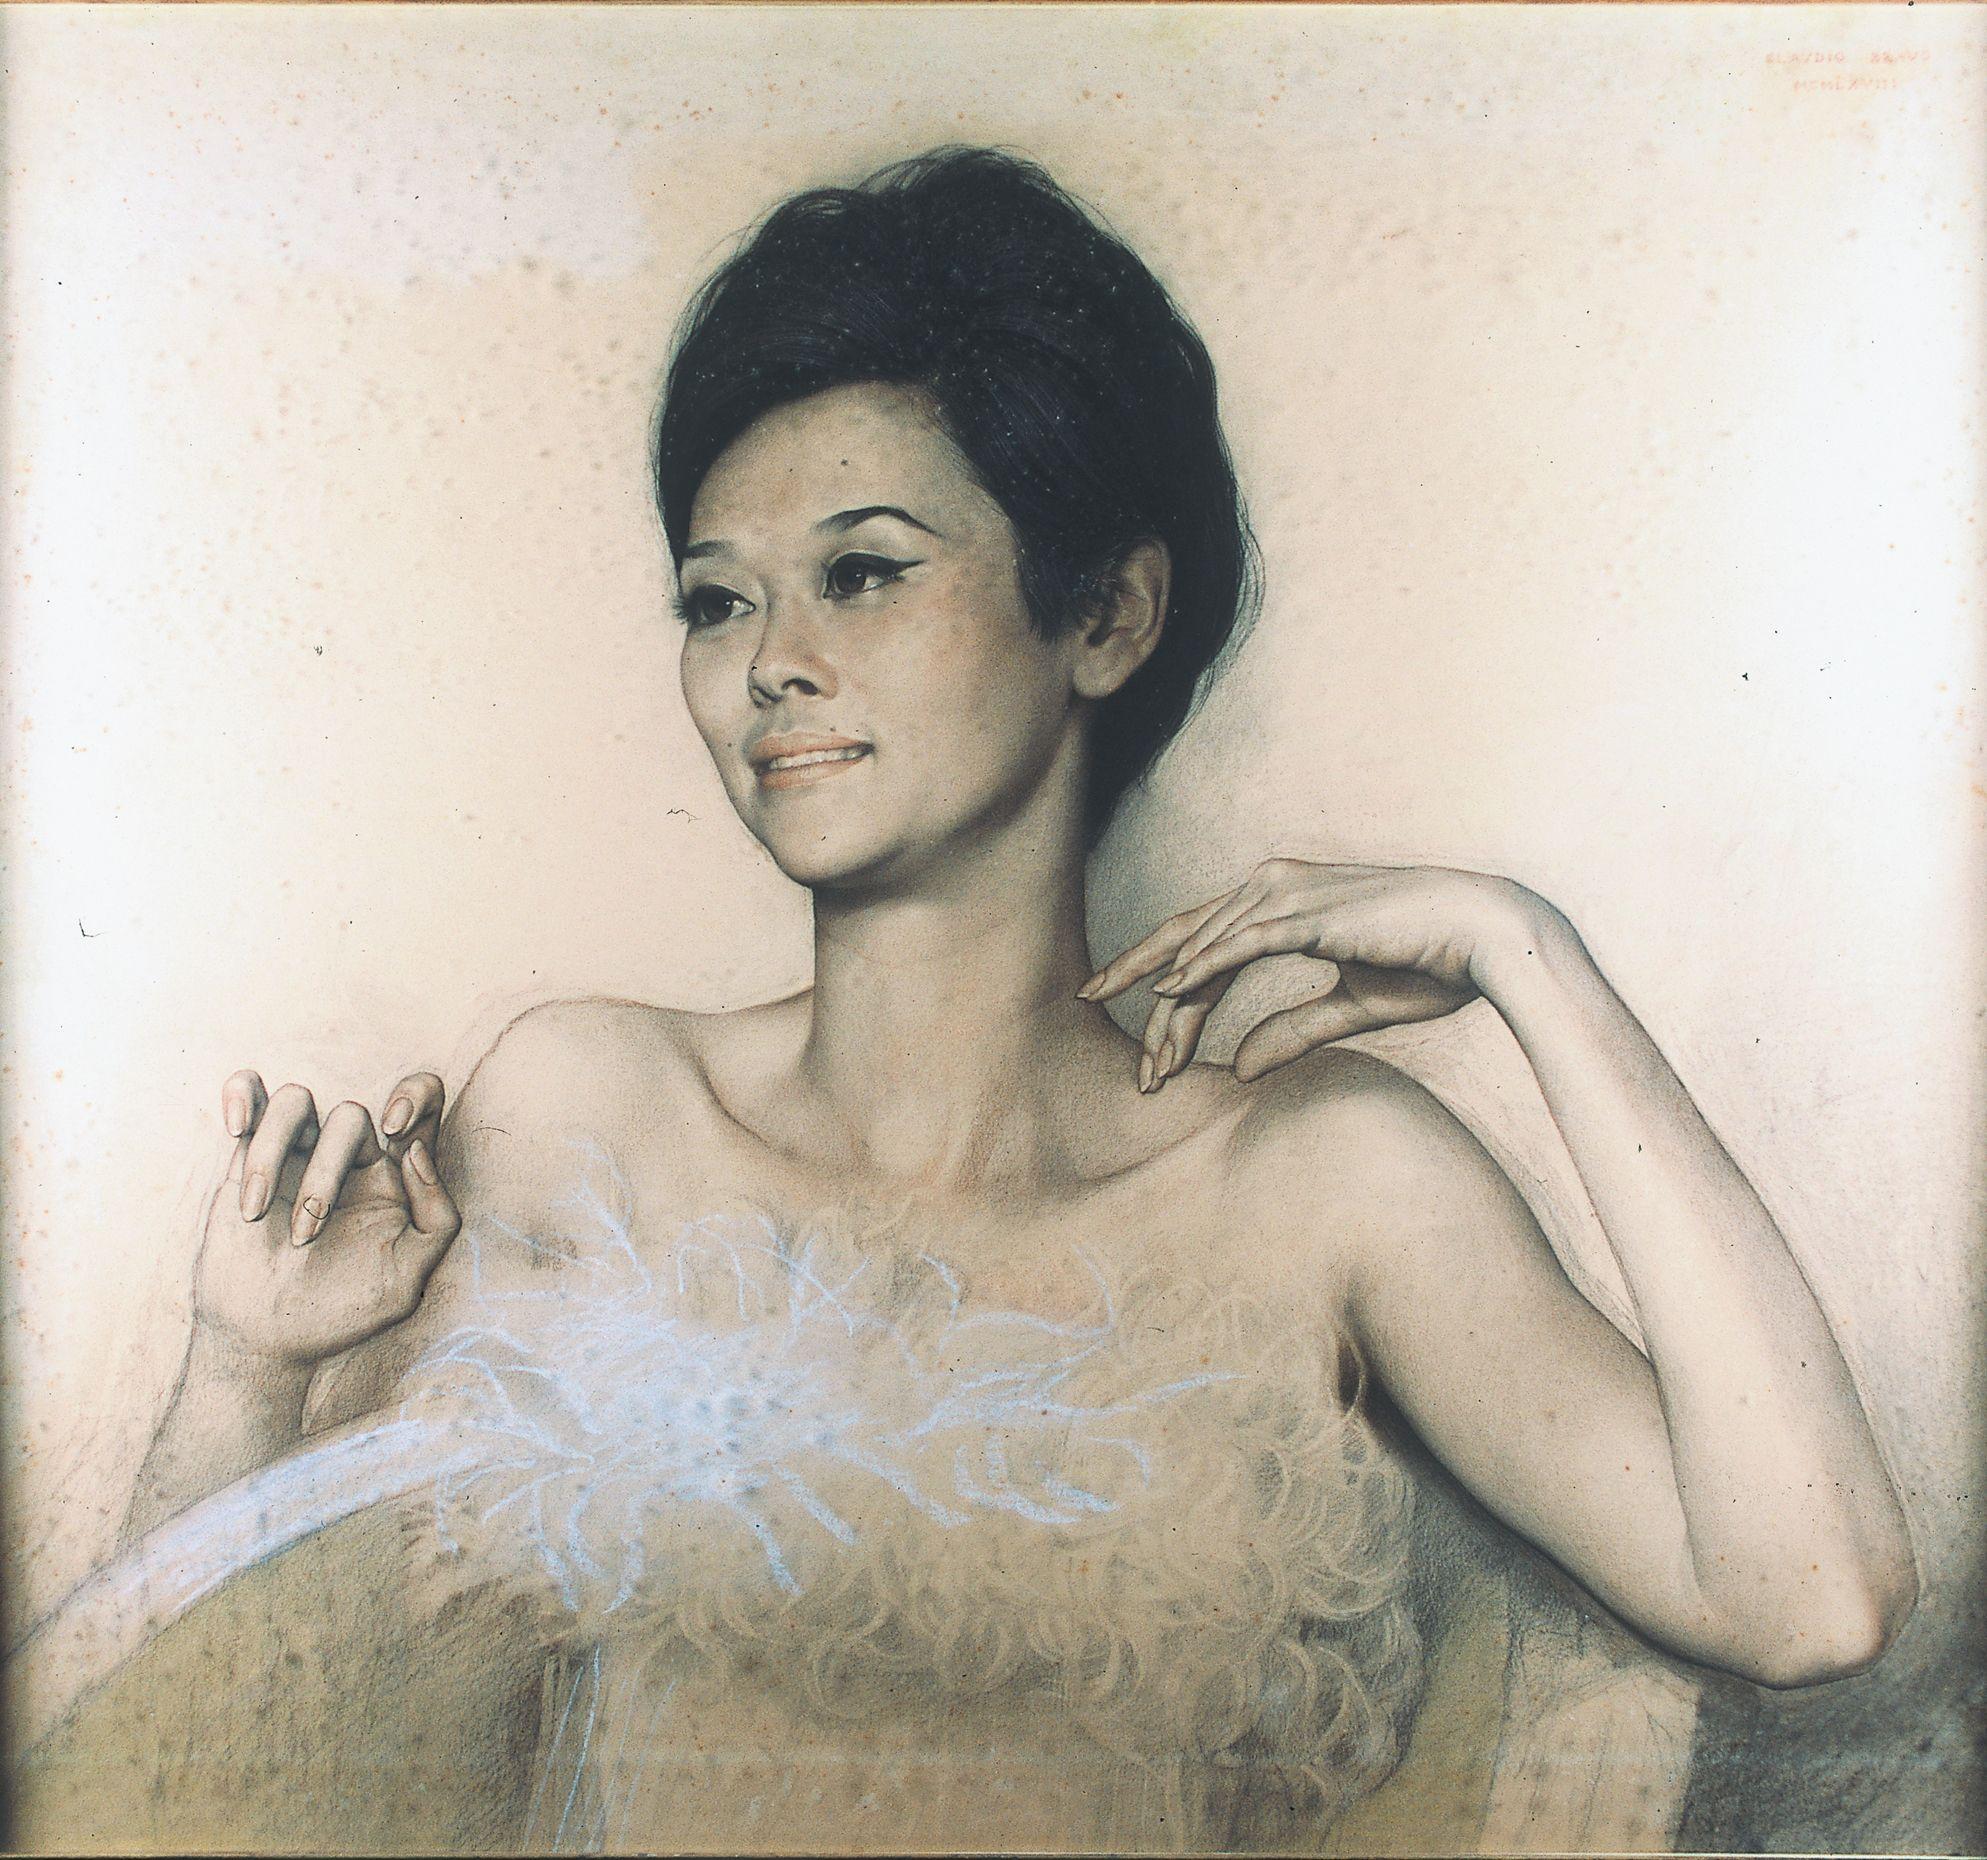 Elvira Manahan, Society And Fashion Icon Remembered